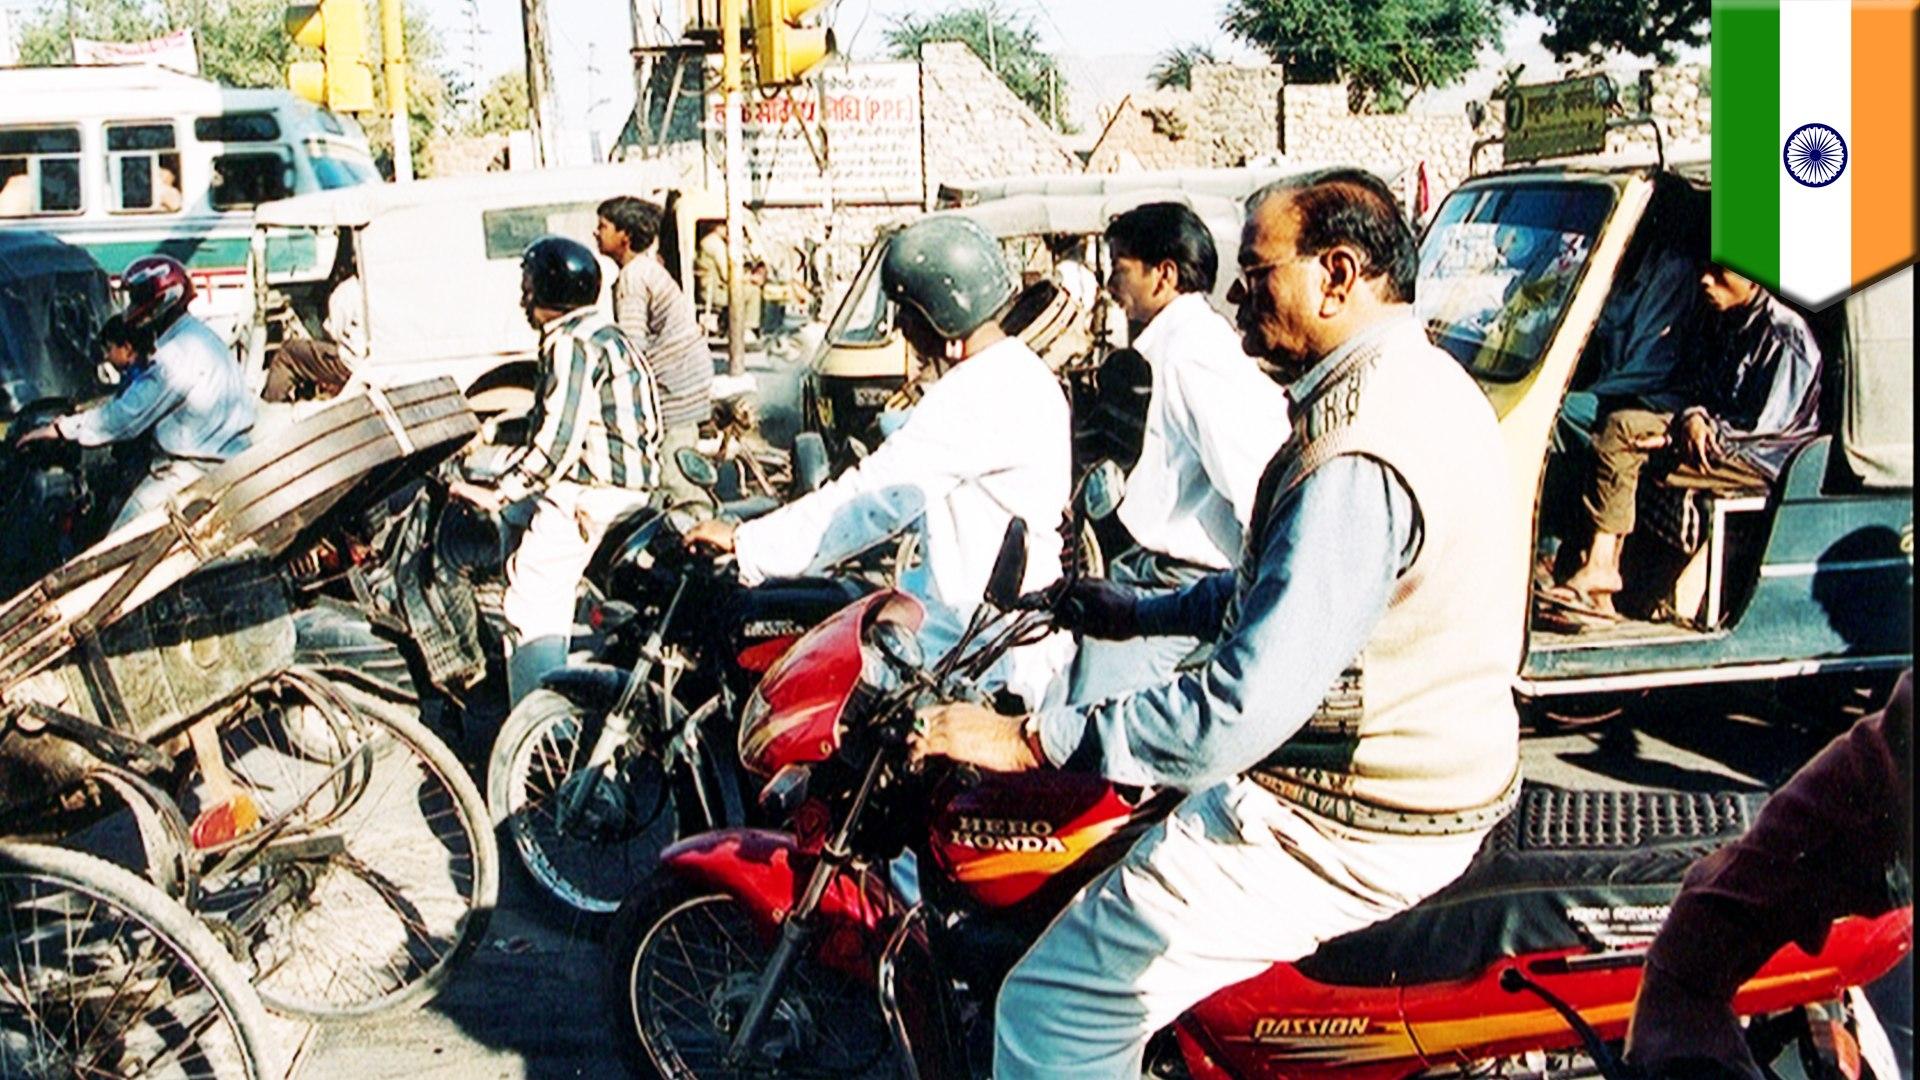 Macet: India dapat bantuan dari Jepang untuk kurangi kemacetan - TomoNews